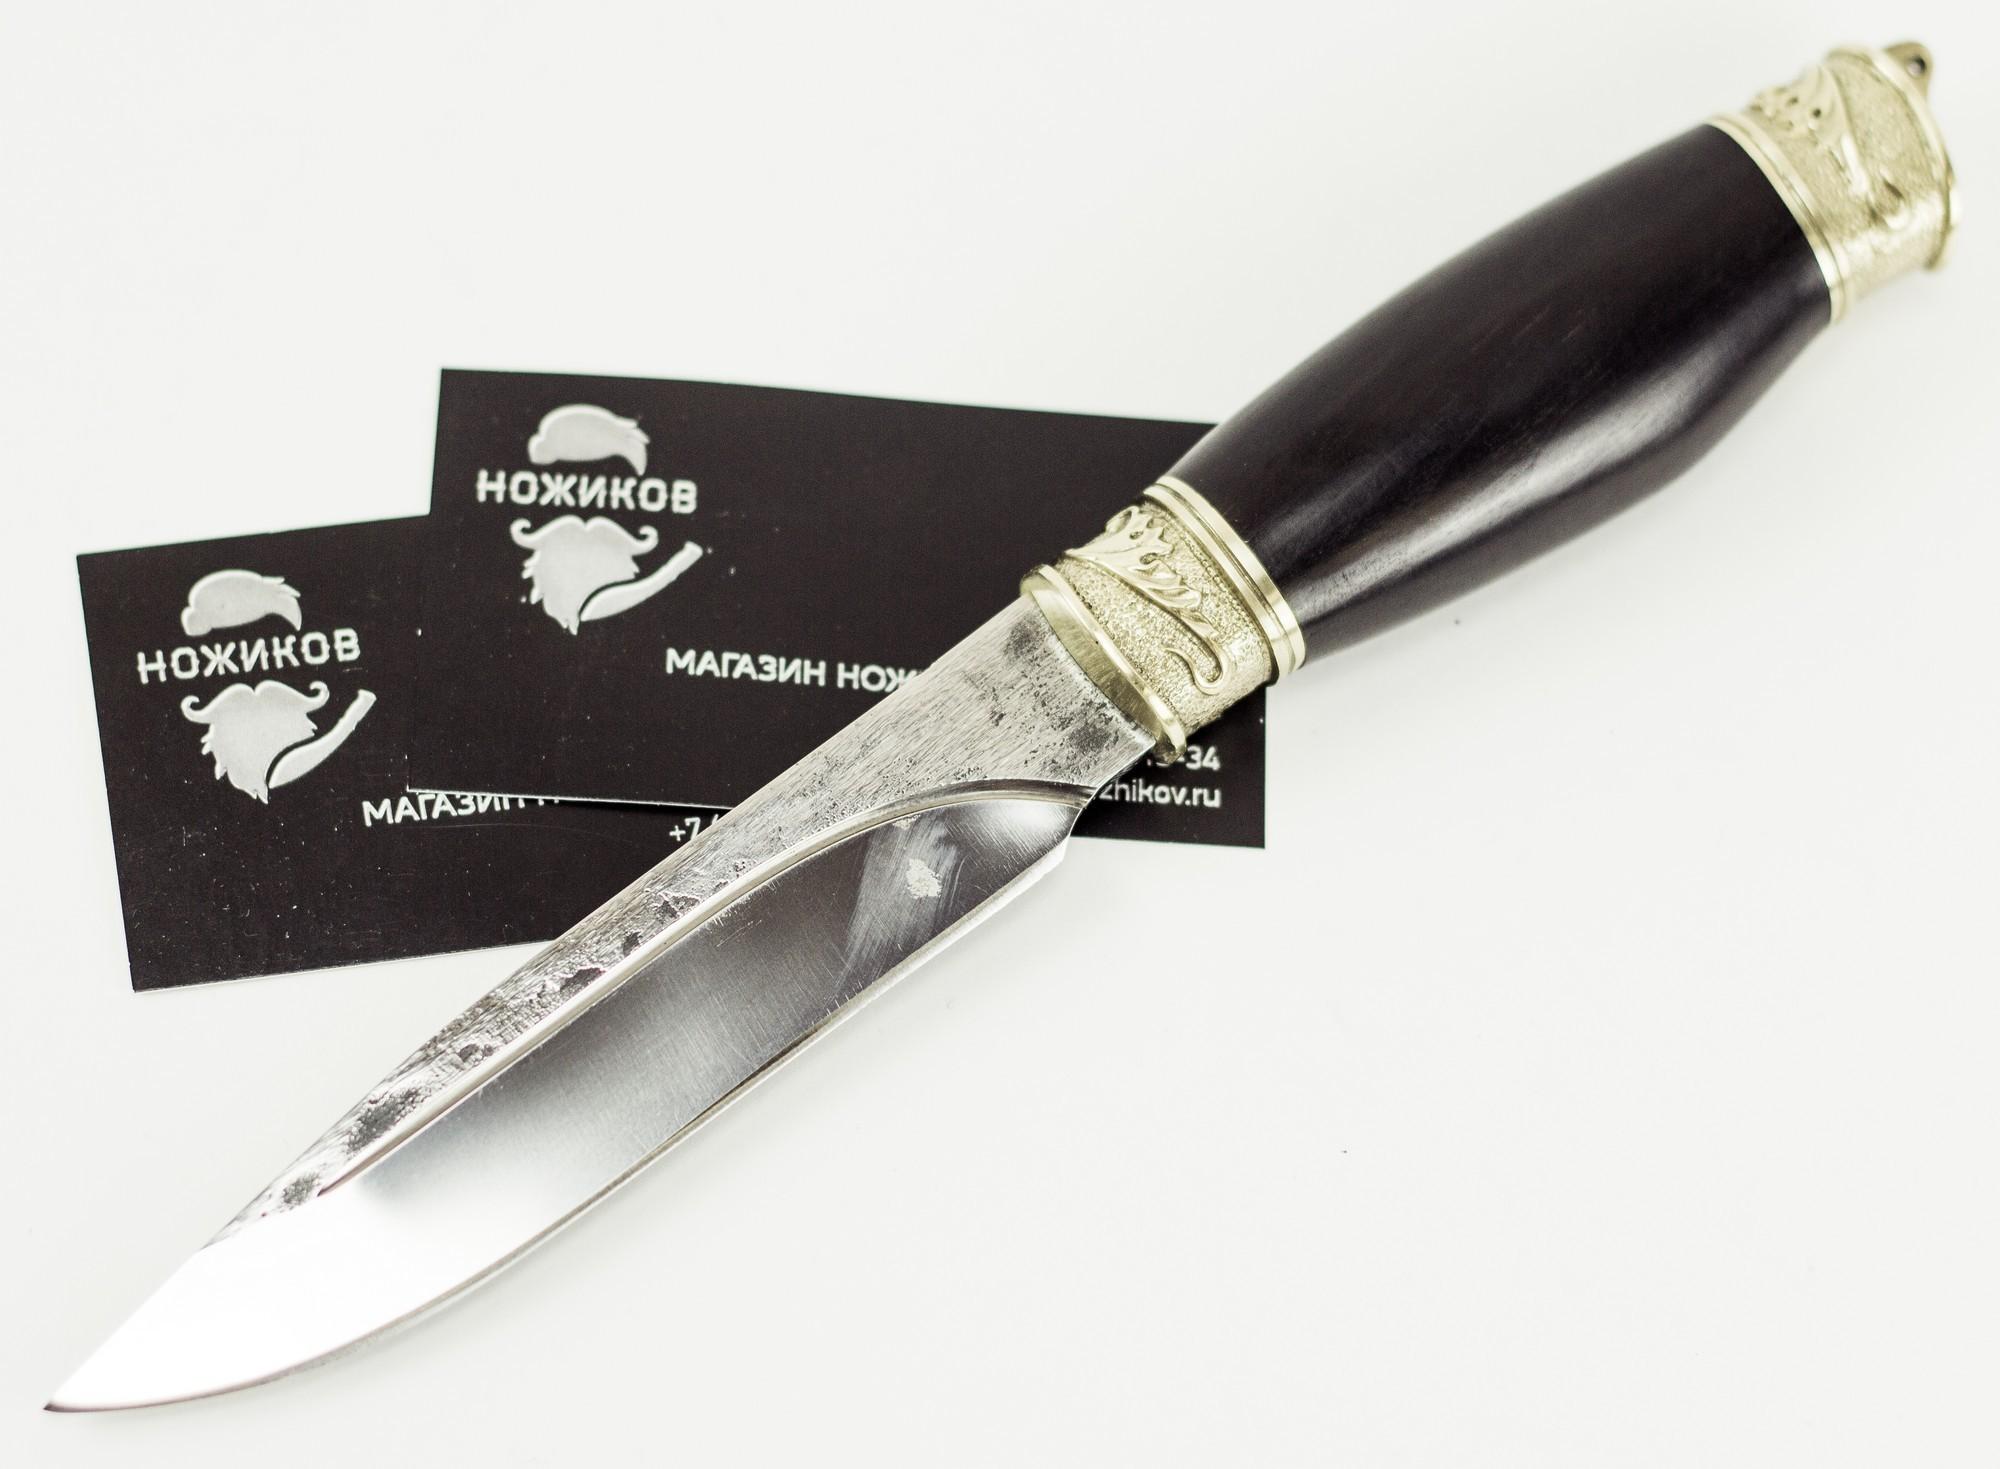 Нож Р-1 из кованой стали х12мф, Кизляр